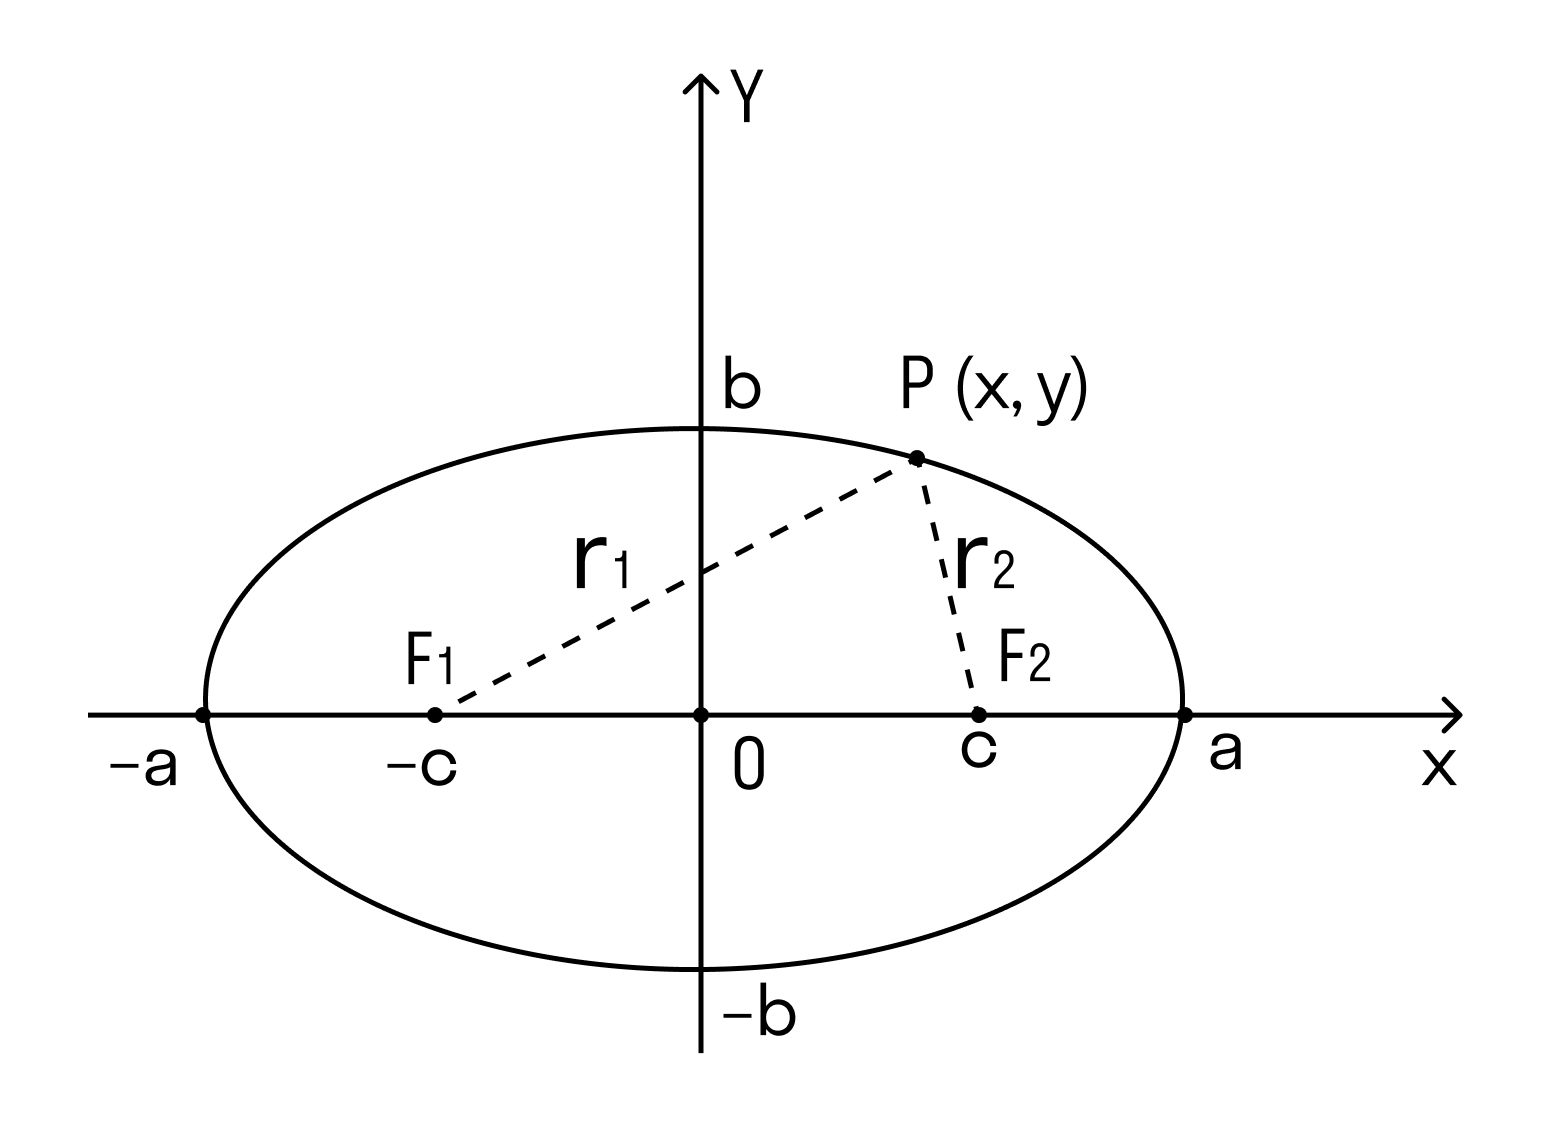 Эллипс и его оси симметрии